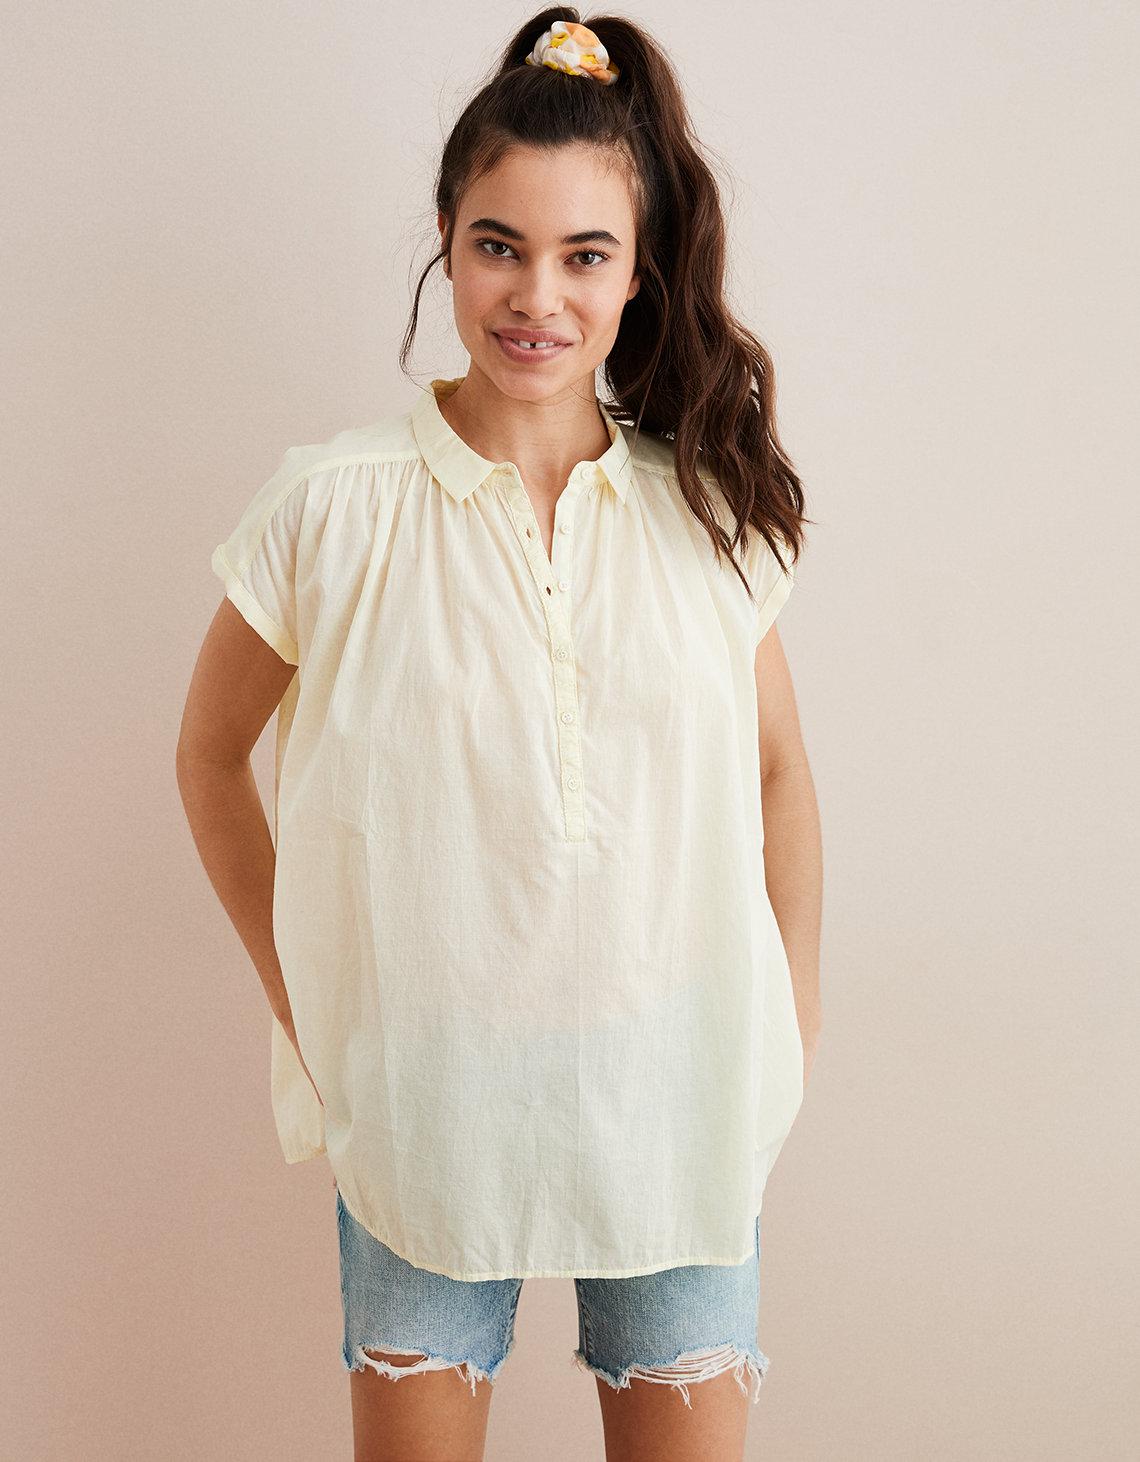 Aerie Woven Popover Shirt